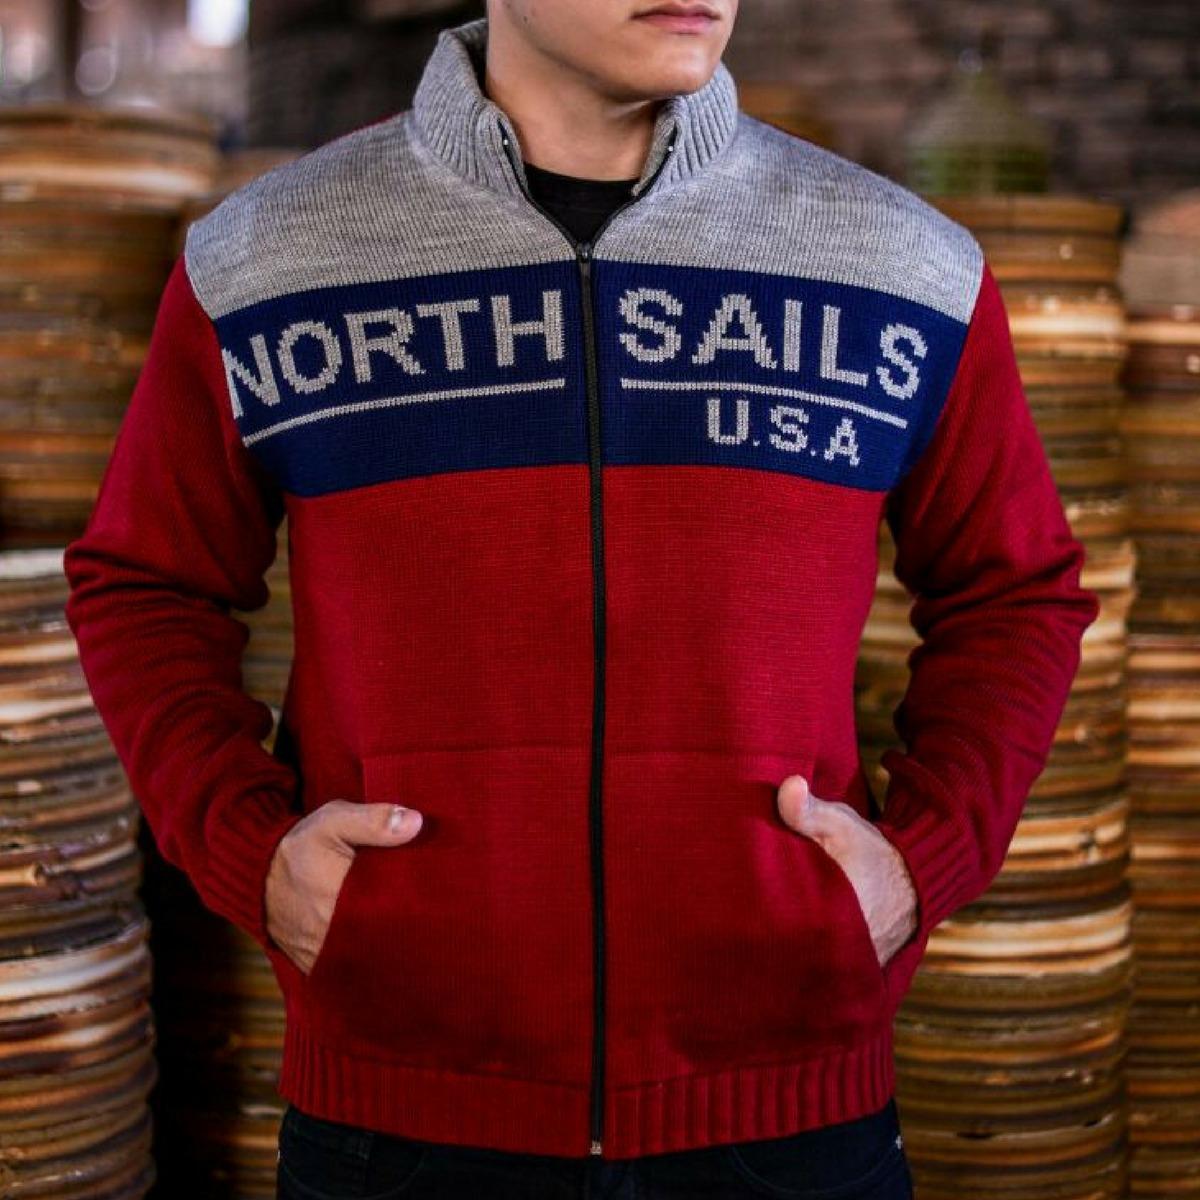 e4a8eaa7e8 jaqueta de frio masculino blusa masculina jaqueta de trico. Carregando zoom.